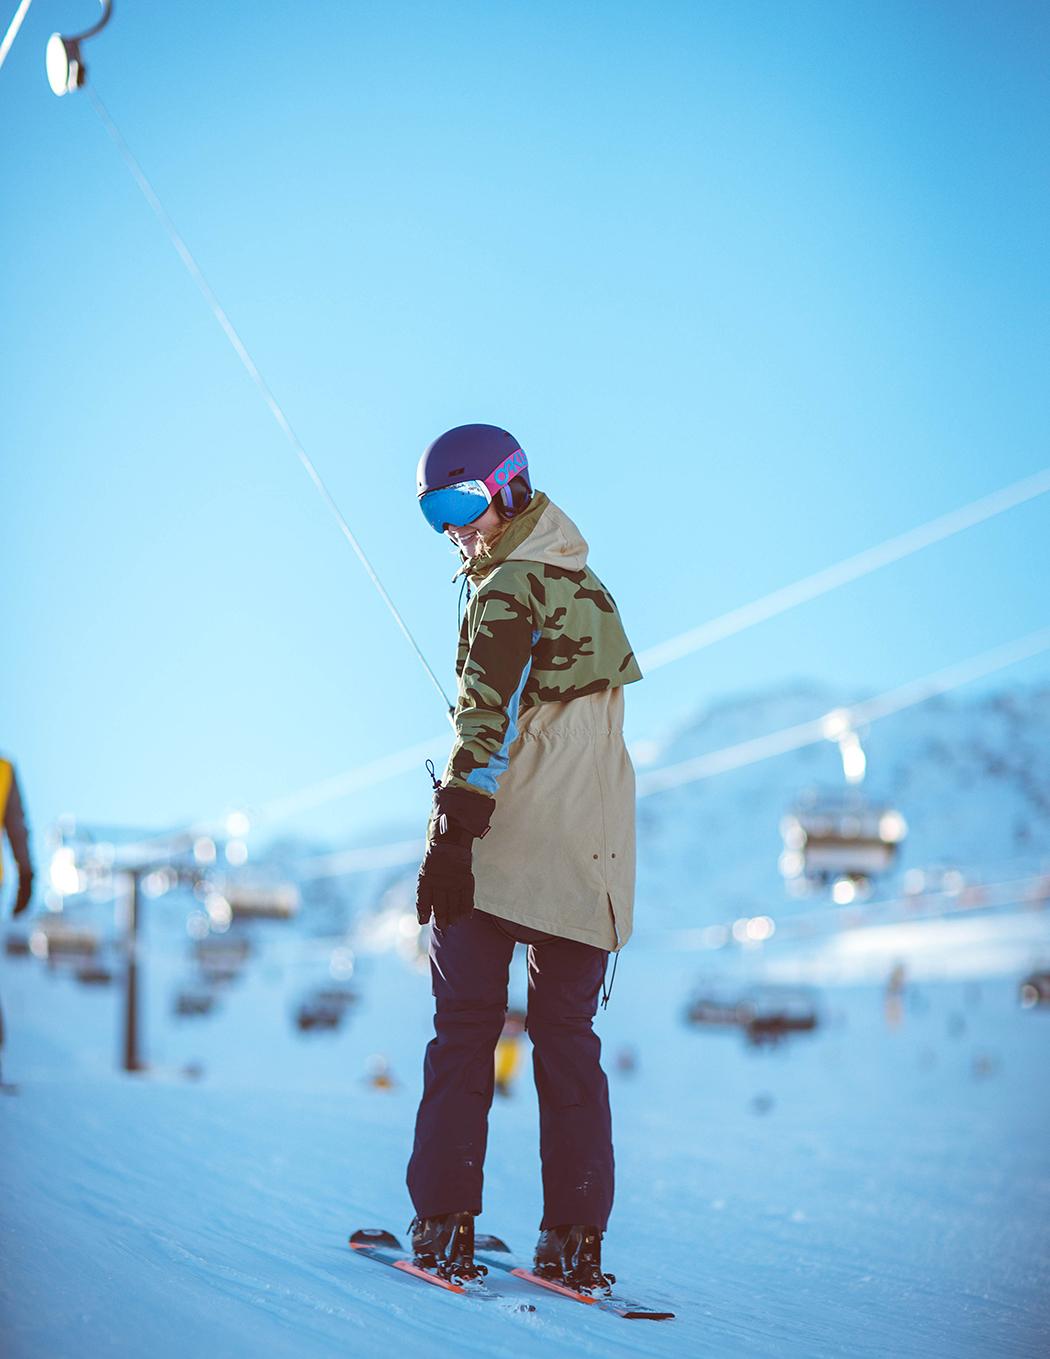 travelblog-travelblogger-travel-blog-blogger-soelden-skifahren-piste-lindarella-muenchen-deutschland-16-web